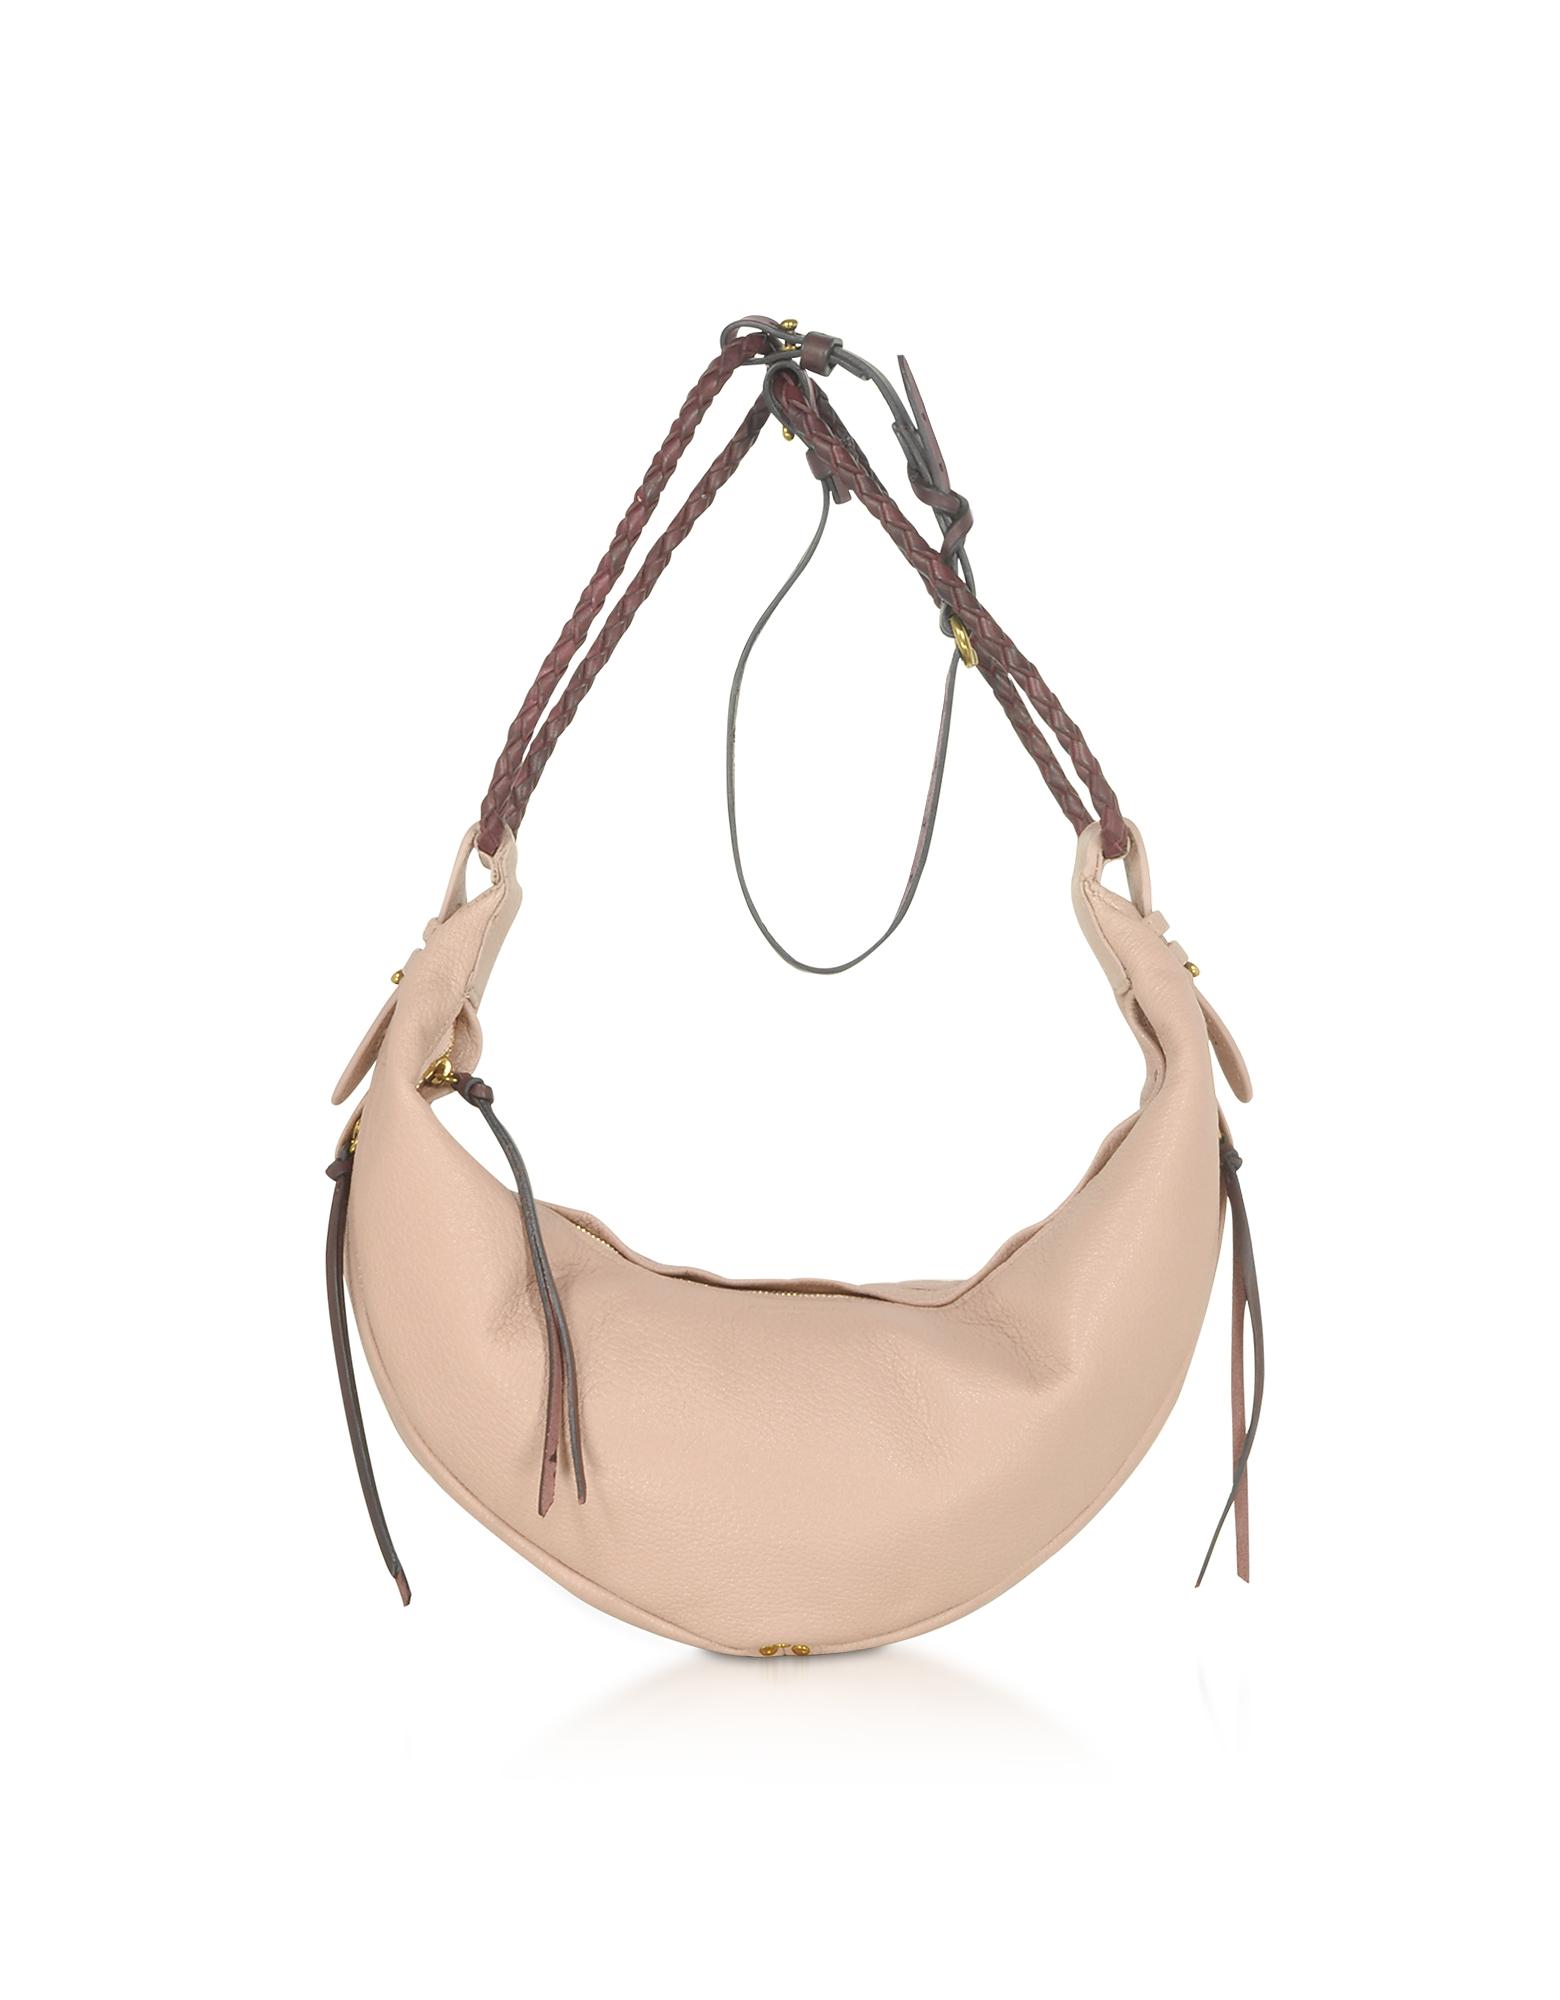 Willy M Leather Shoulder Bag